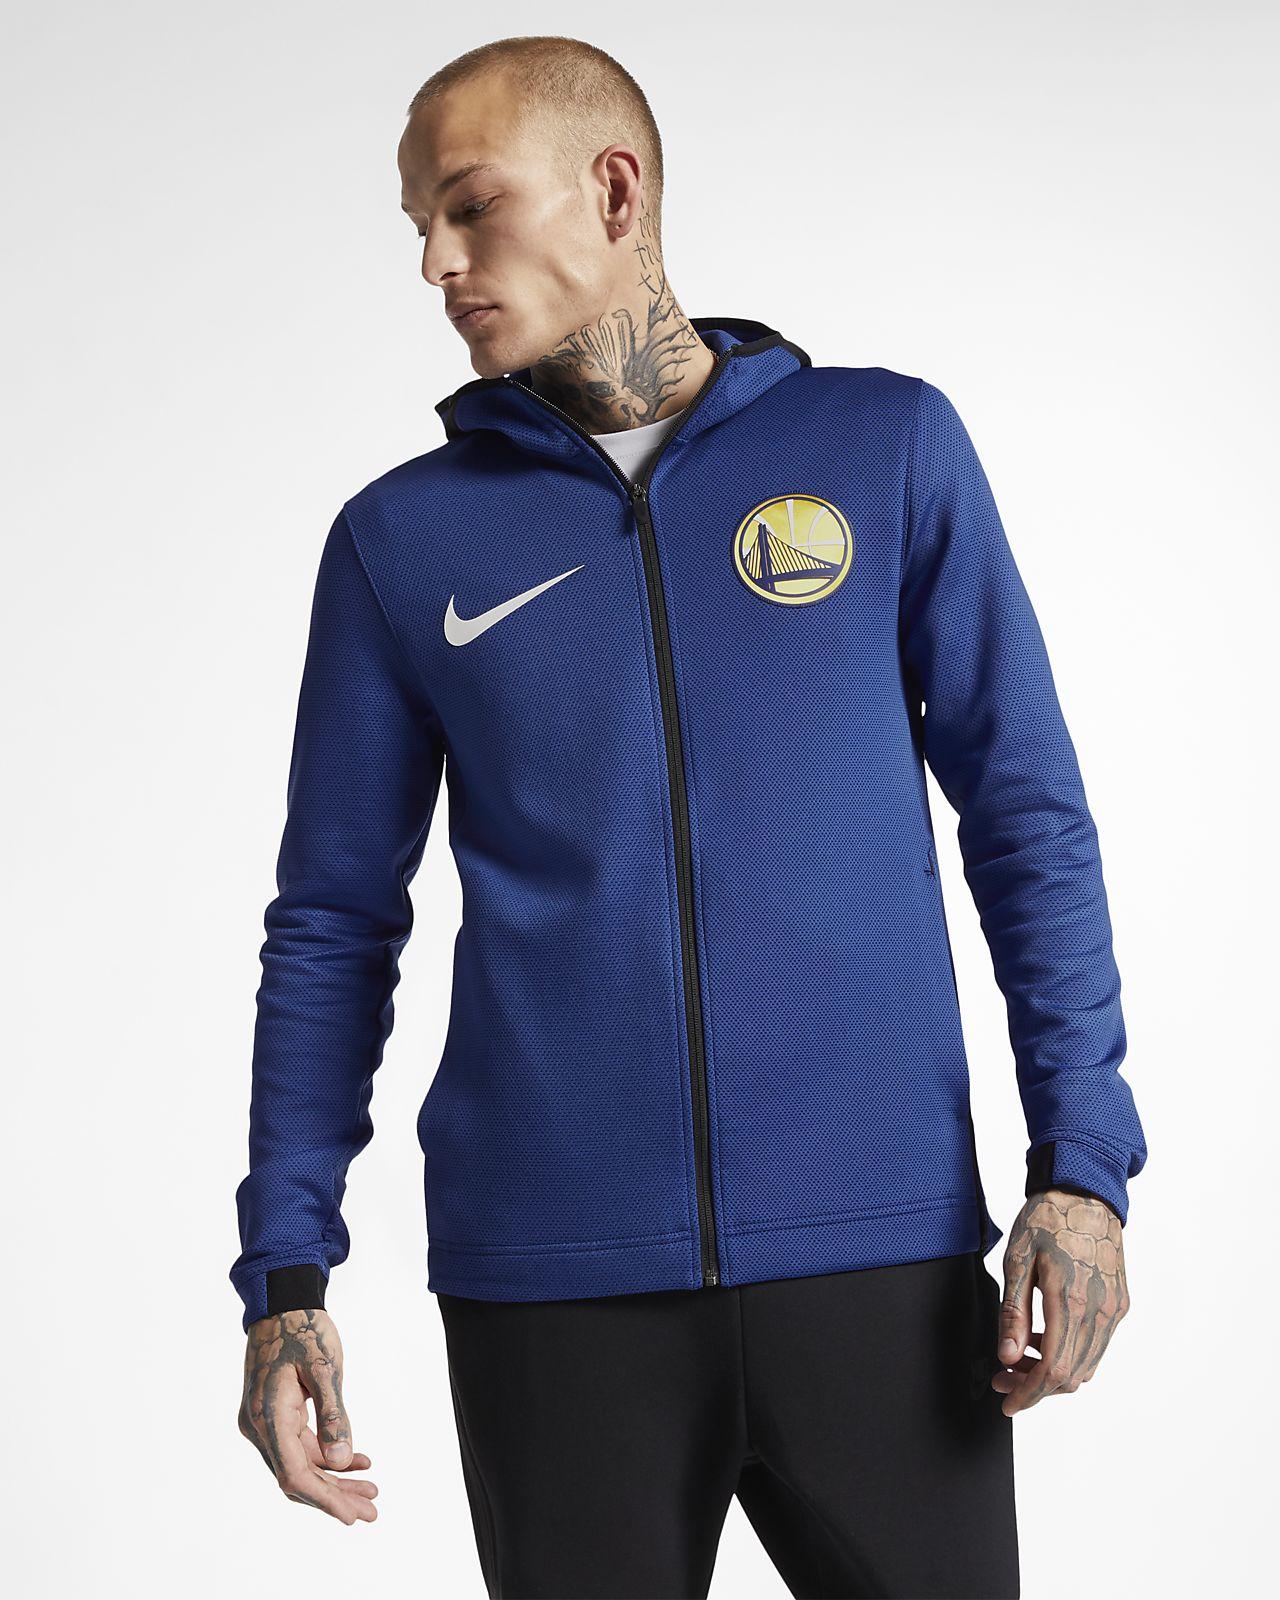 Golden State Warriors Nike Therma Flex Showtime Men's NBA Hoodie